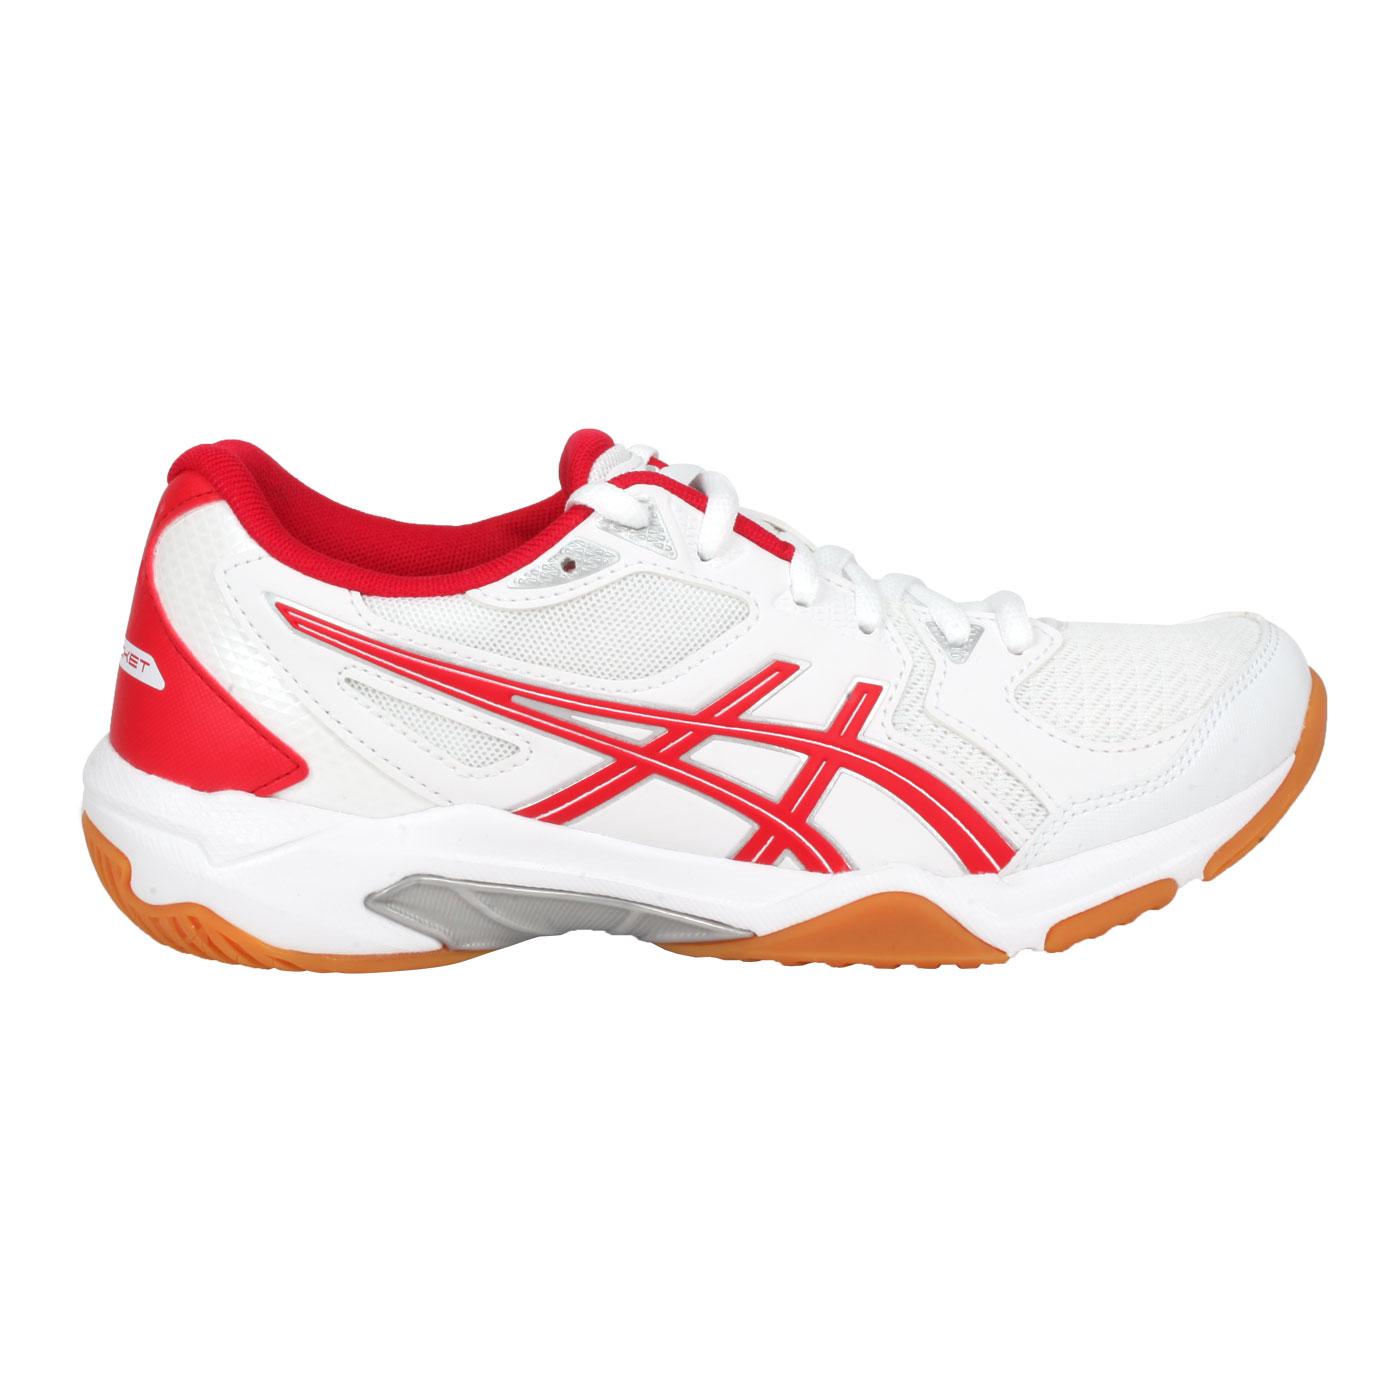 ASICS 女款排羽球鞋  @GEL-ROCKET 10@1072A056-100